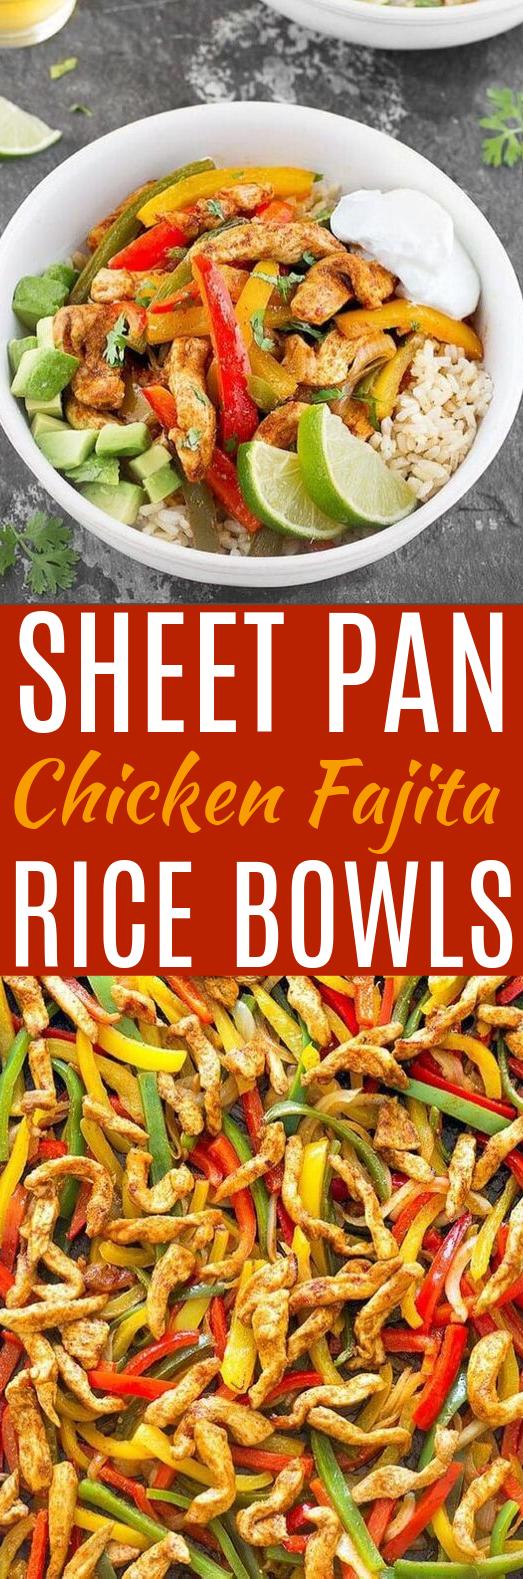 Sheet Pan Chicken Fajita Rice Bowls #dinner #chicken